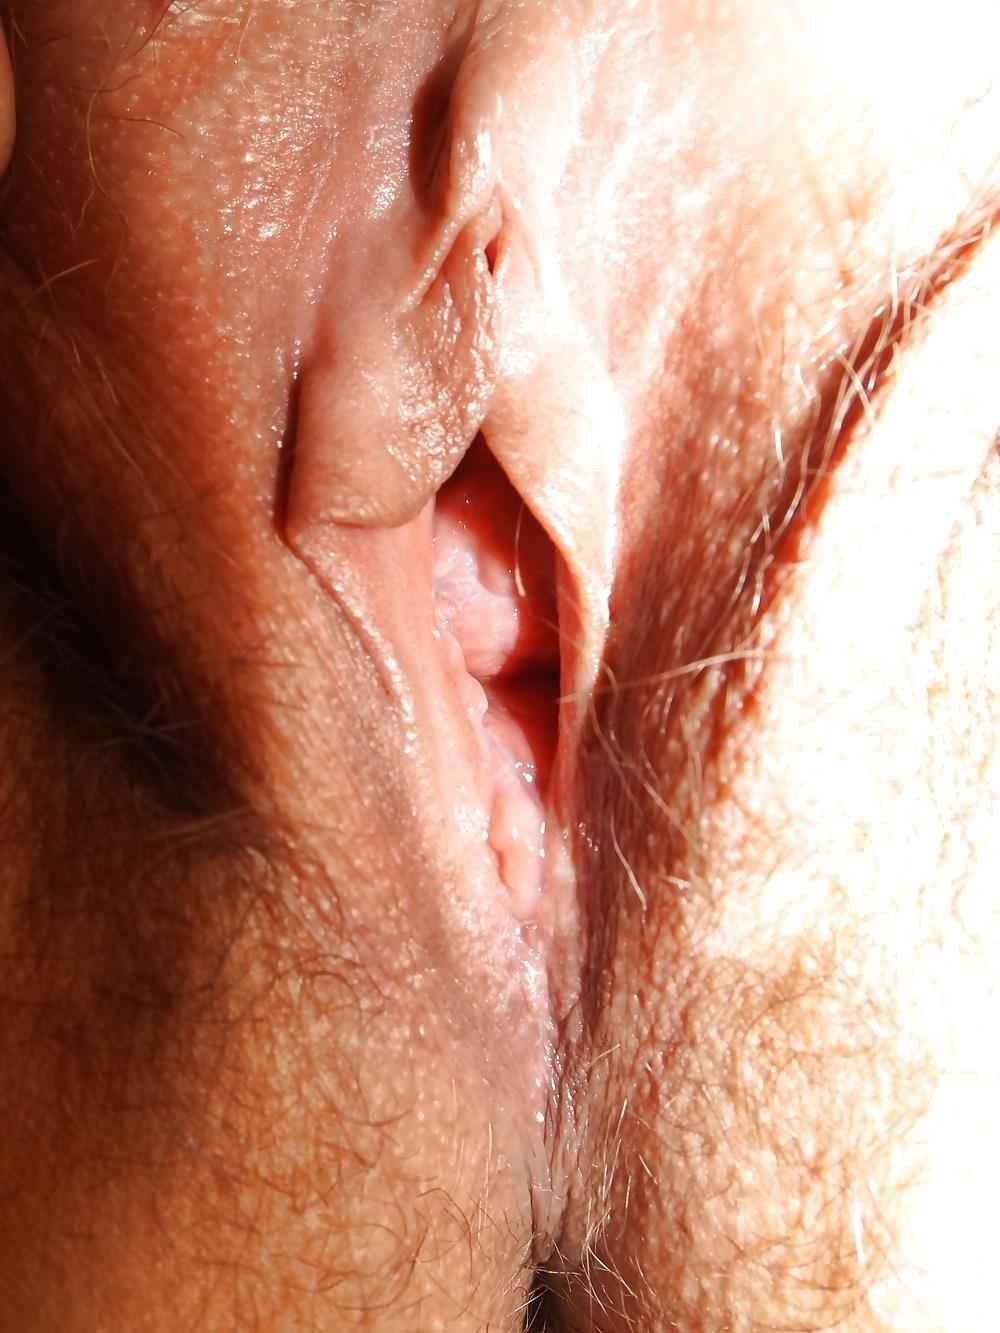 Xnxx boobs anal-9788